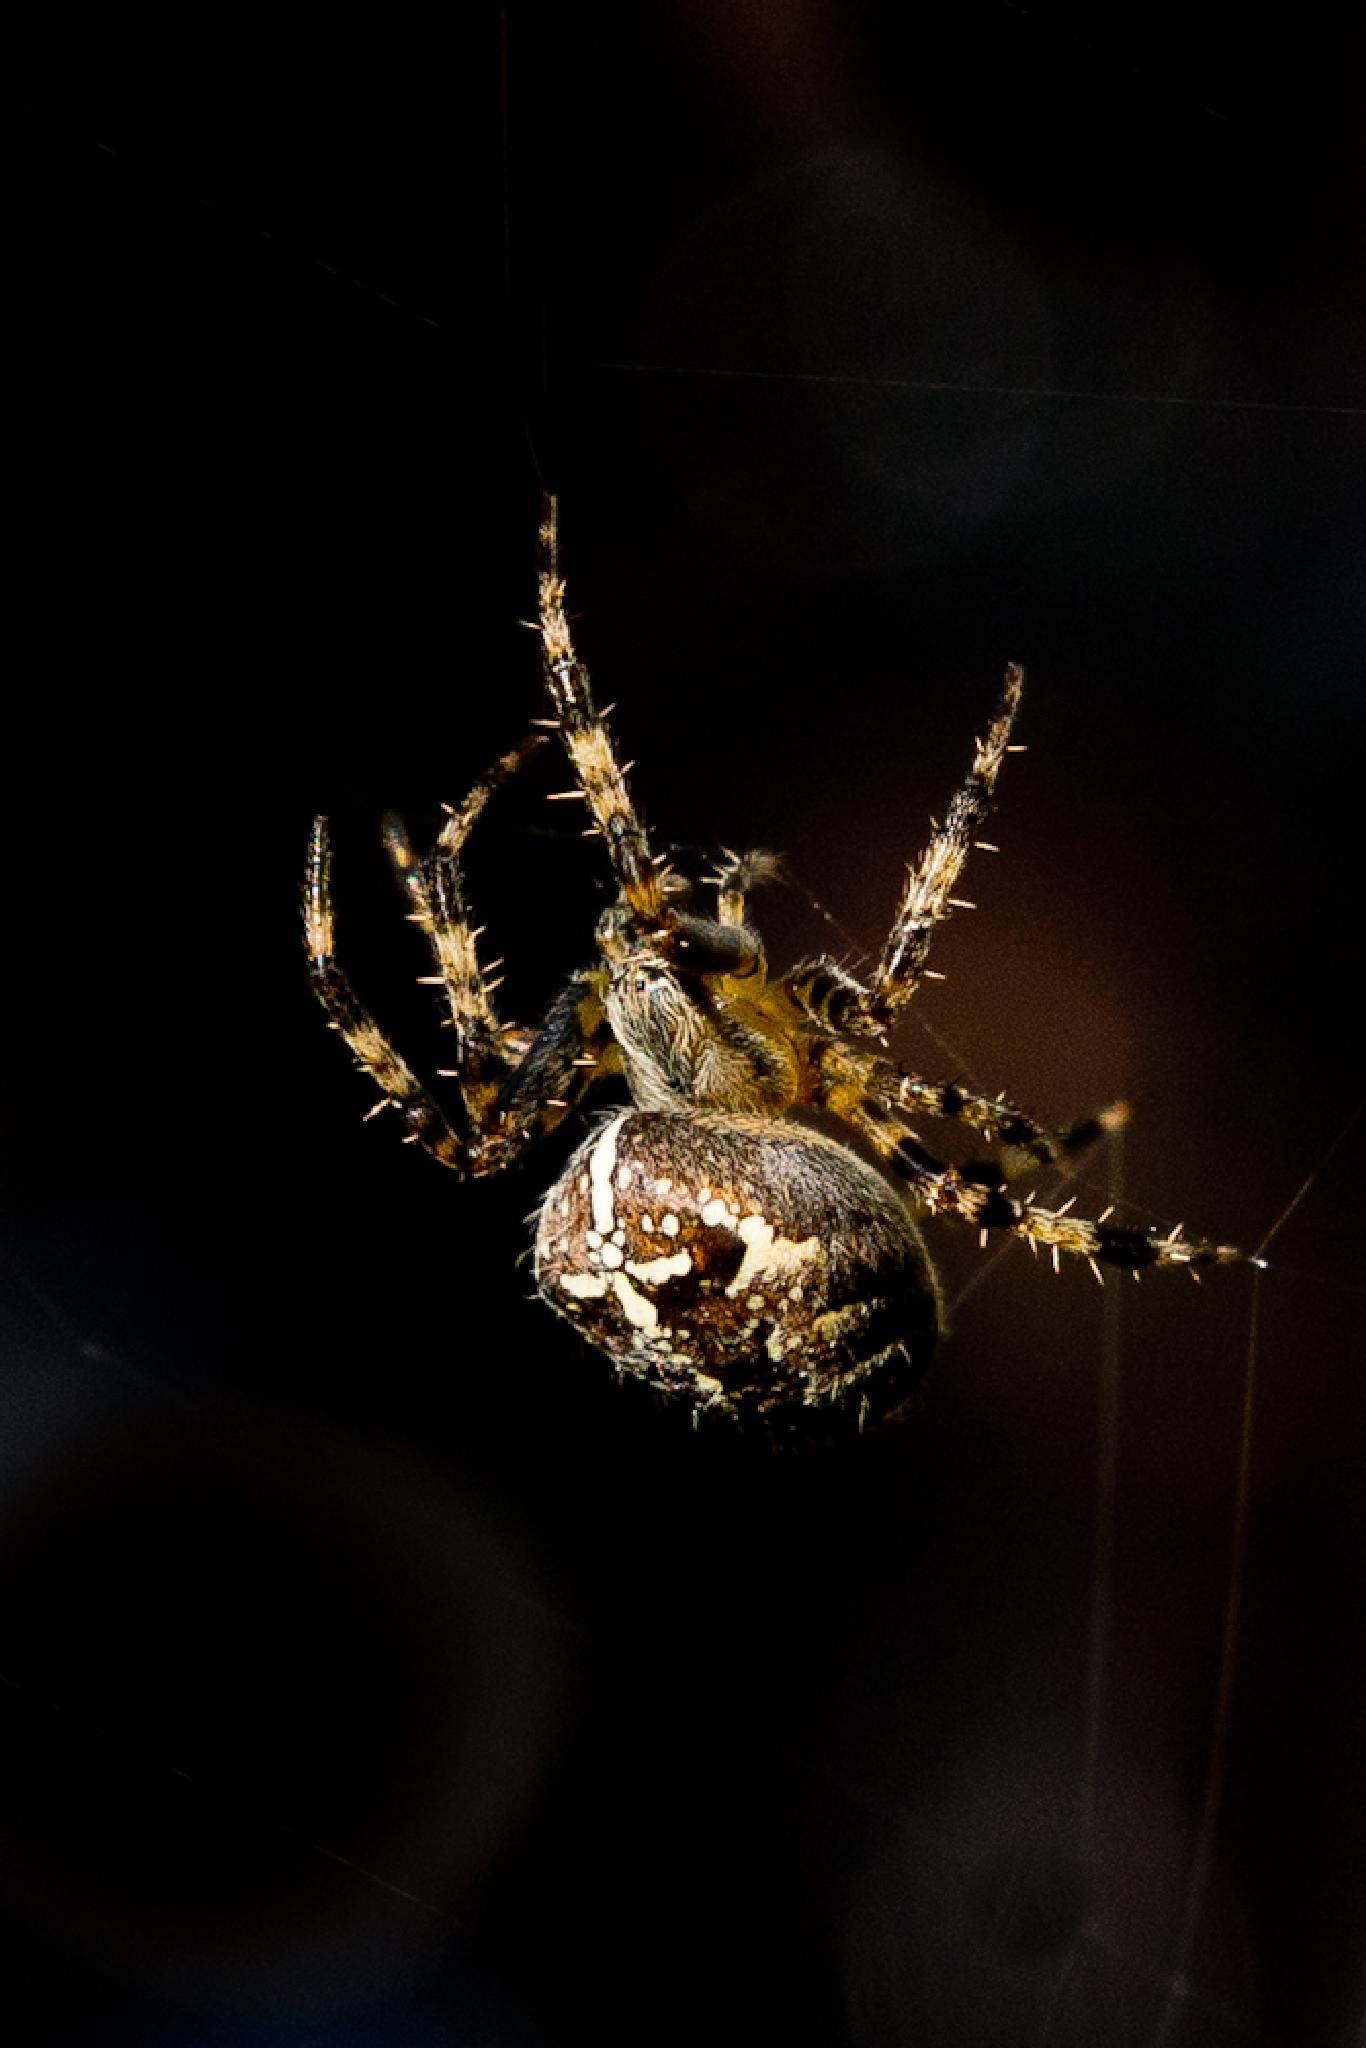 Spider by knorth26